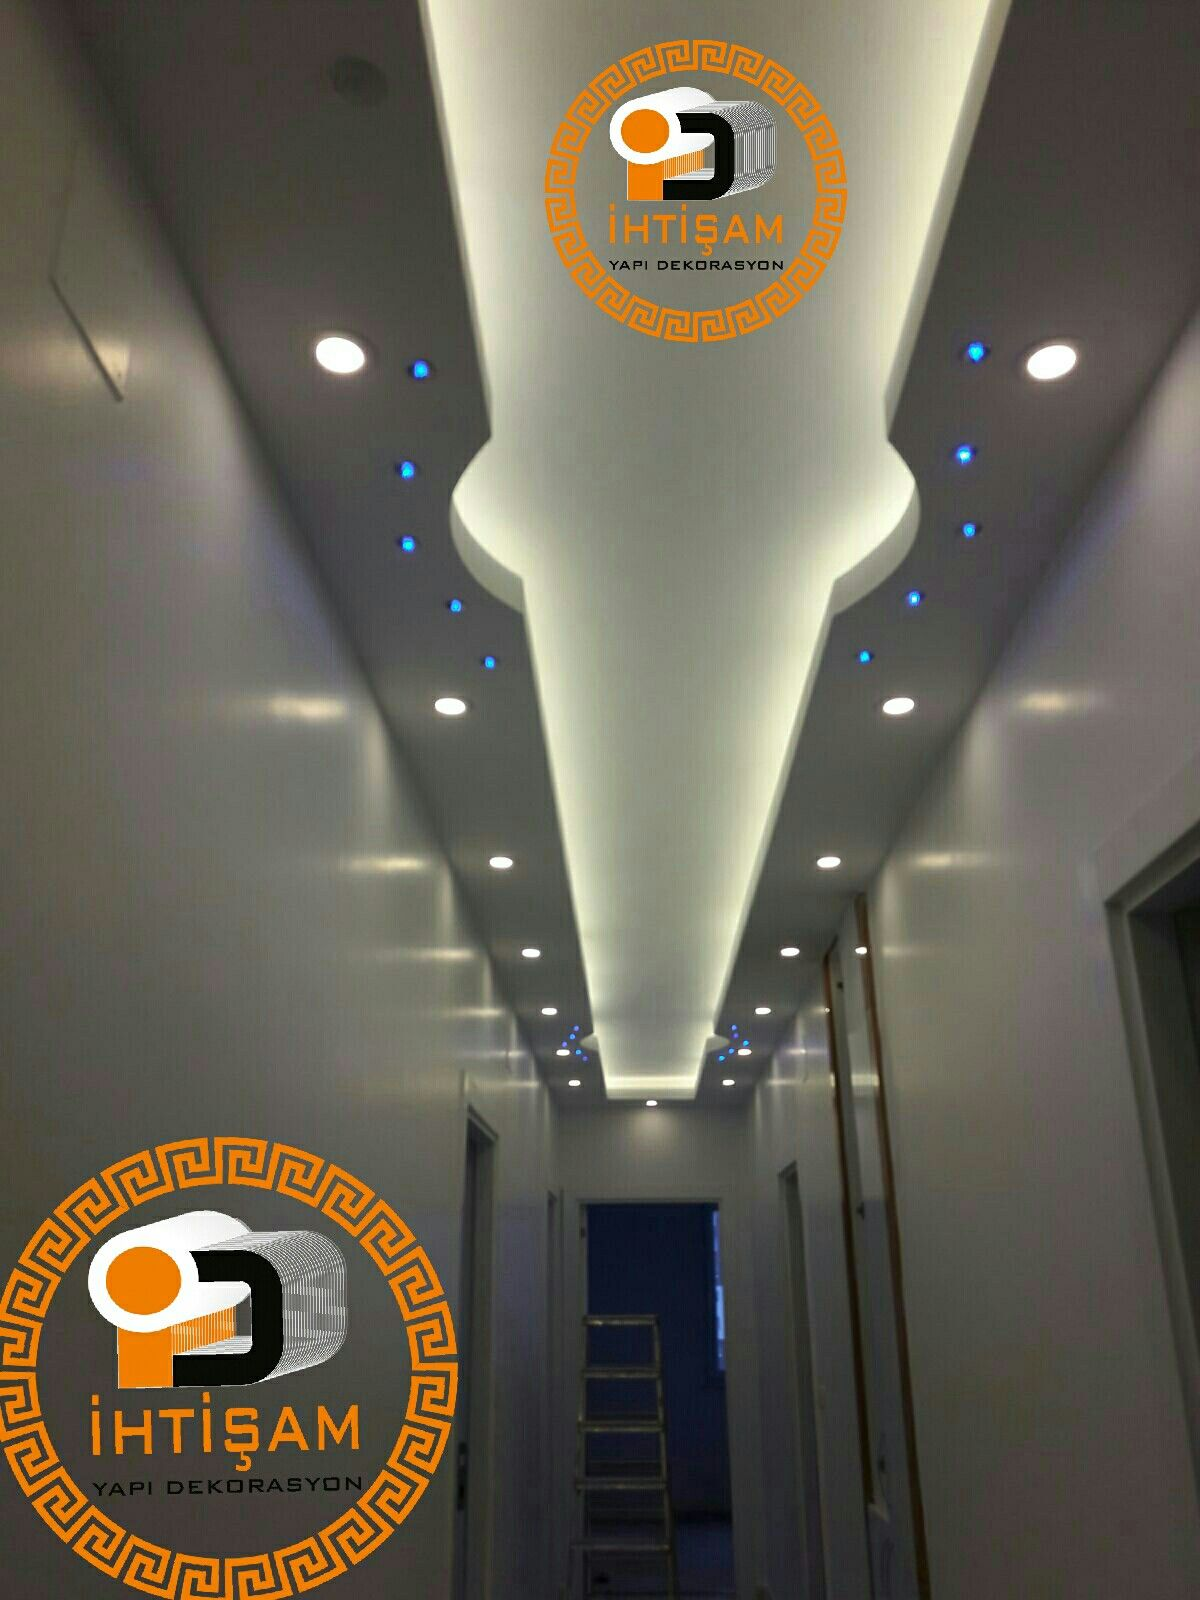 Pin By الضوي الوايلي On Asma Tavan Modelleri Gizli Isik Bandi Modelleri Ceiling Design False Ceiling Design Ceiling Design Modern